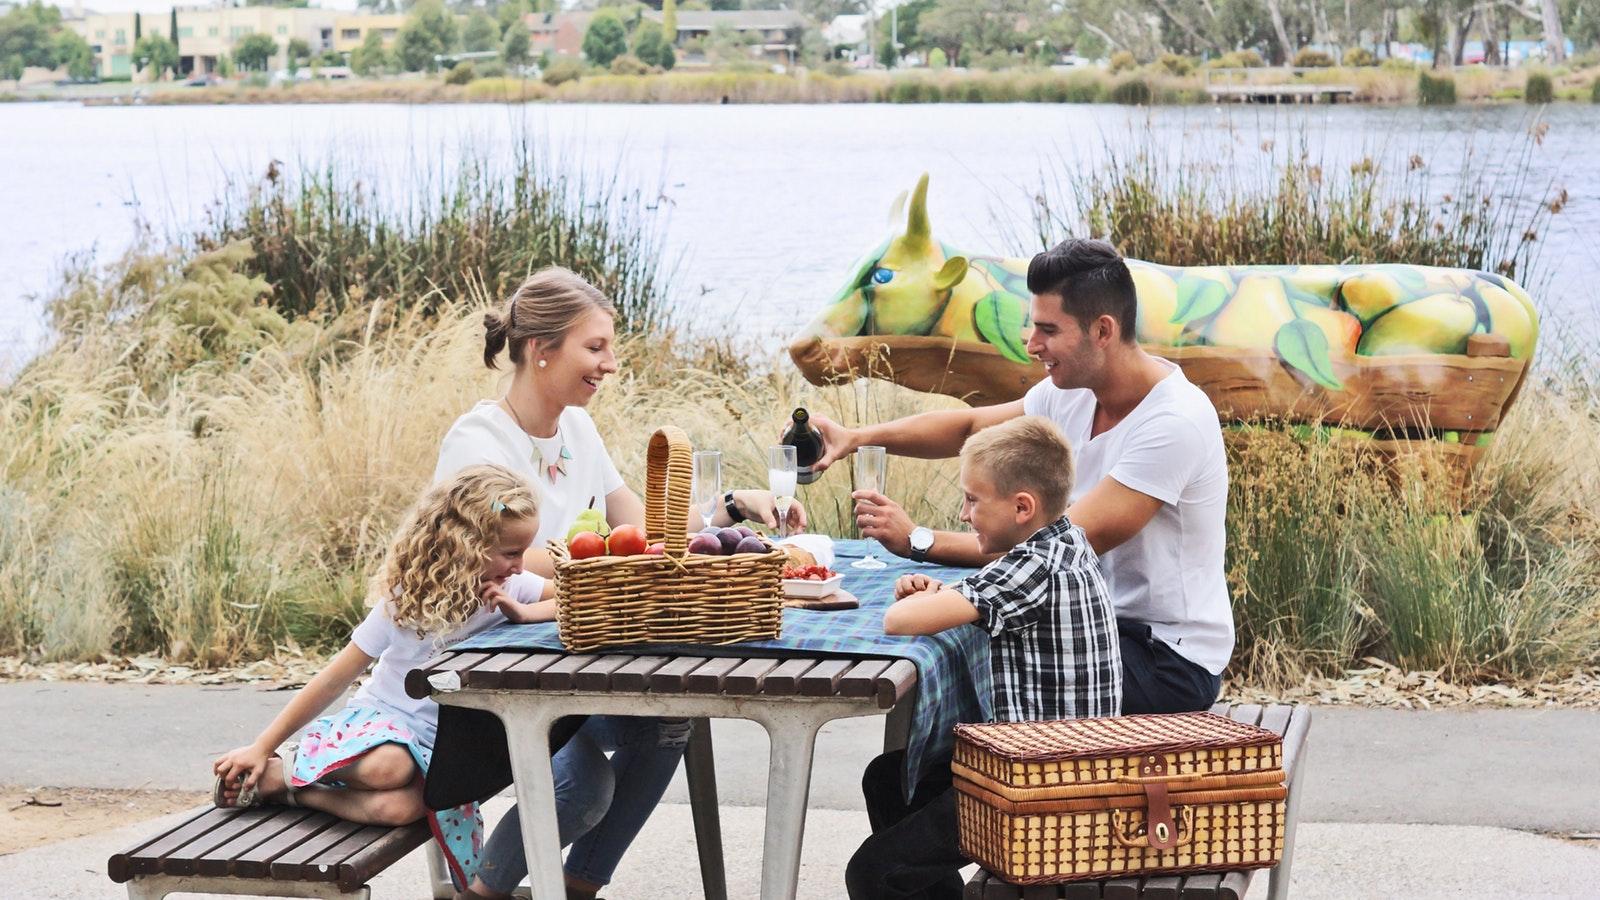 Picnic facilities, Victoria Park Lake, include accessible picnic tables